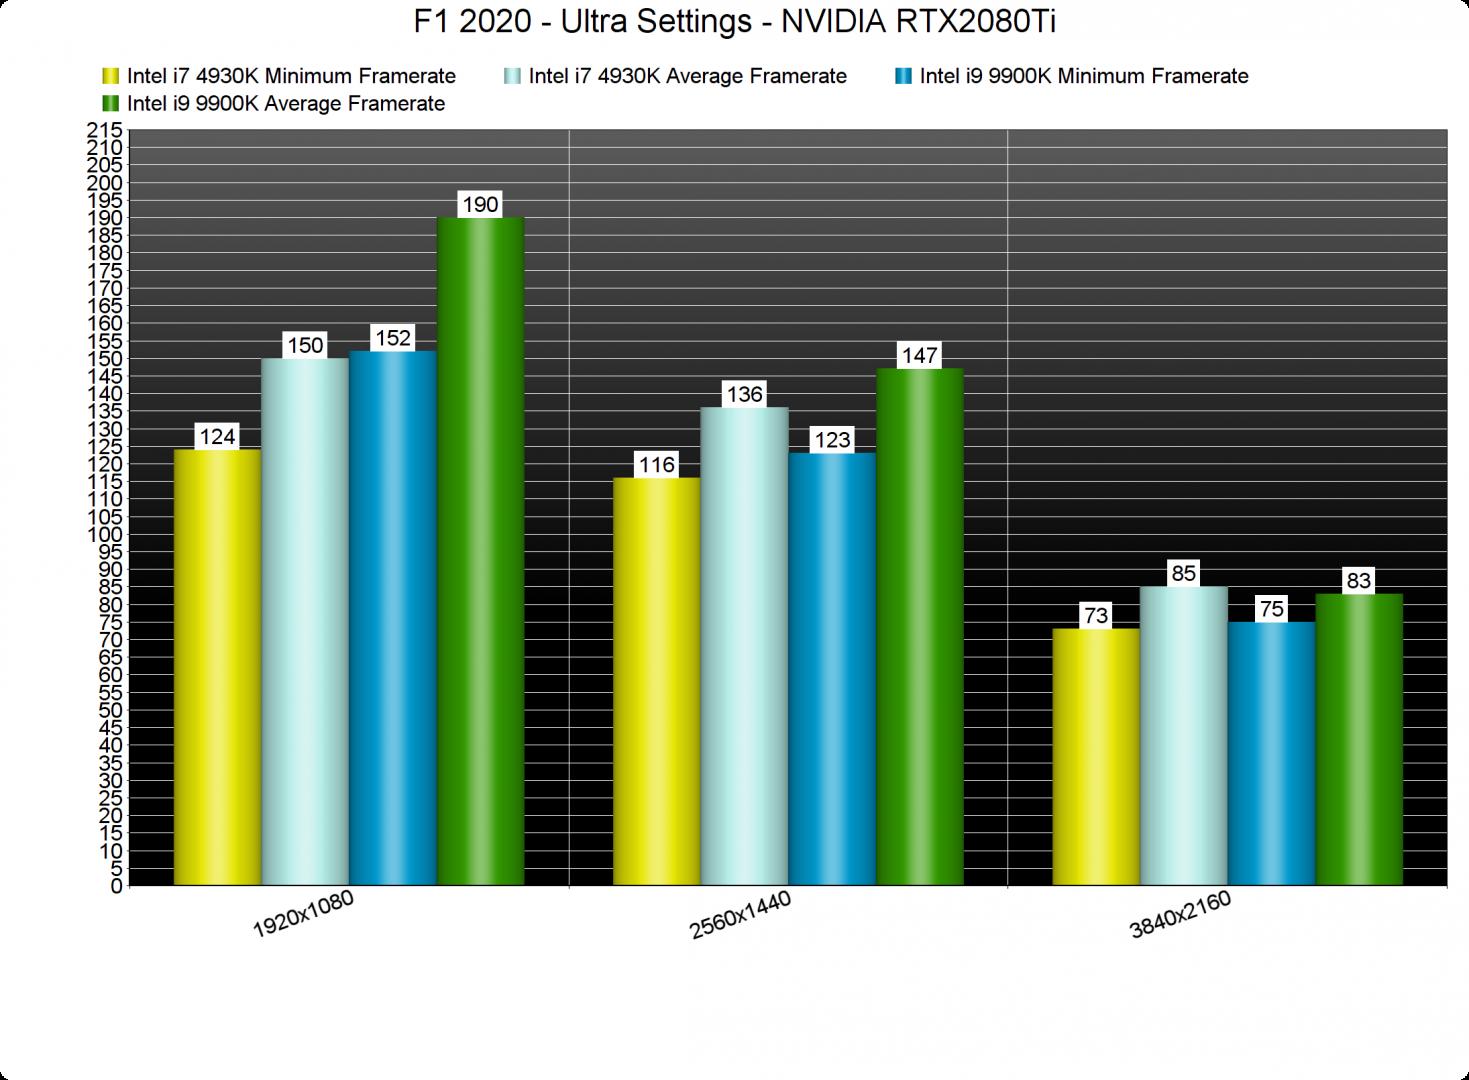 F1 2020 CPU benchmarks-2